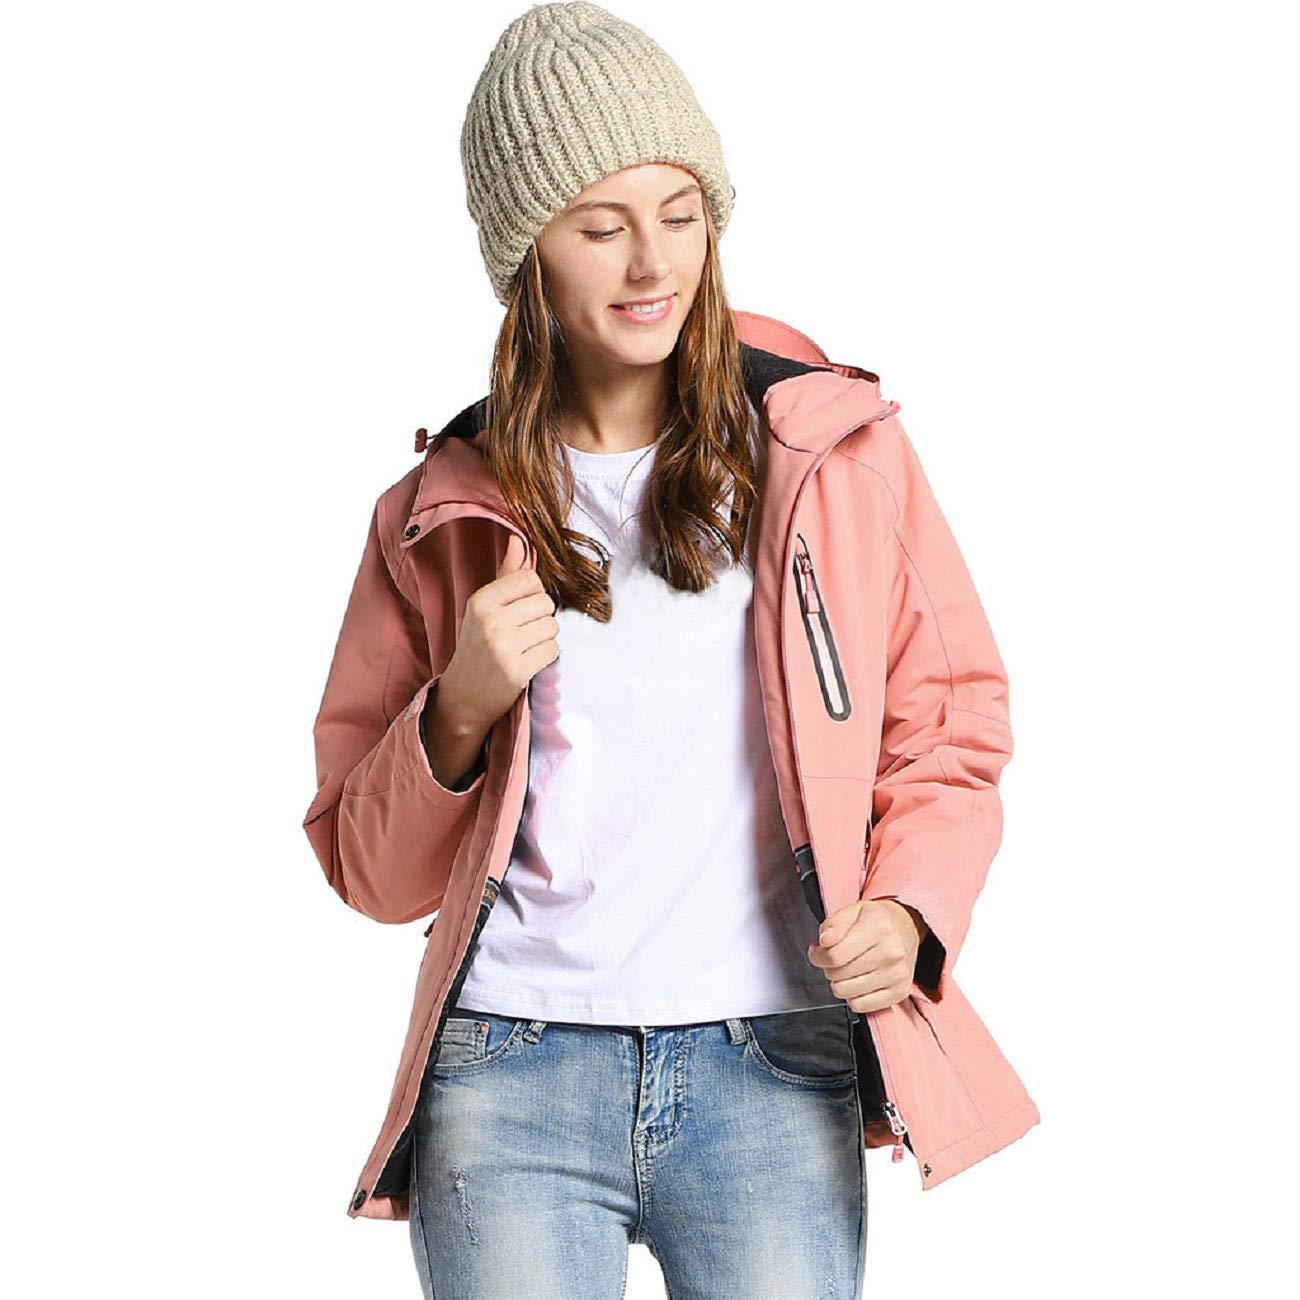 Reokoou Winter Women Three-Speed Temperature Control USB Charging Heating Warm Jacket Long Sleeve Hooded Jacket Soft Top Pink by Reokoou